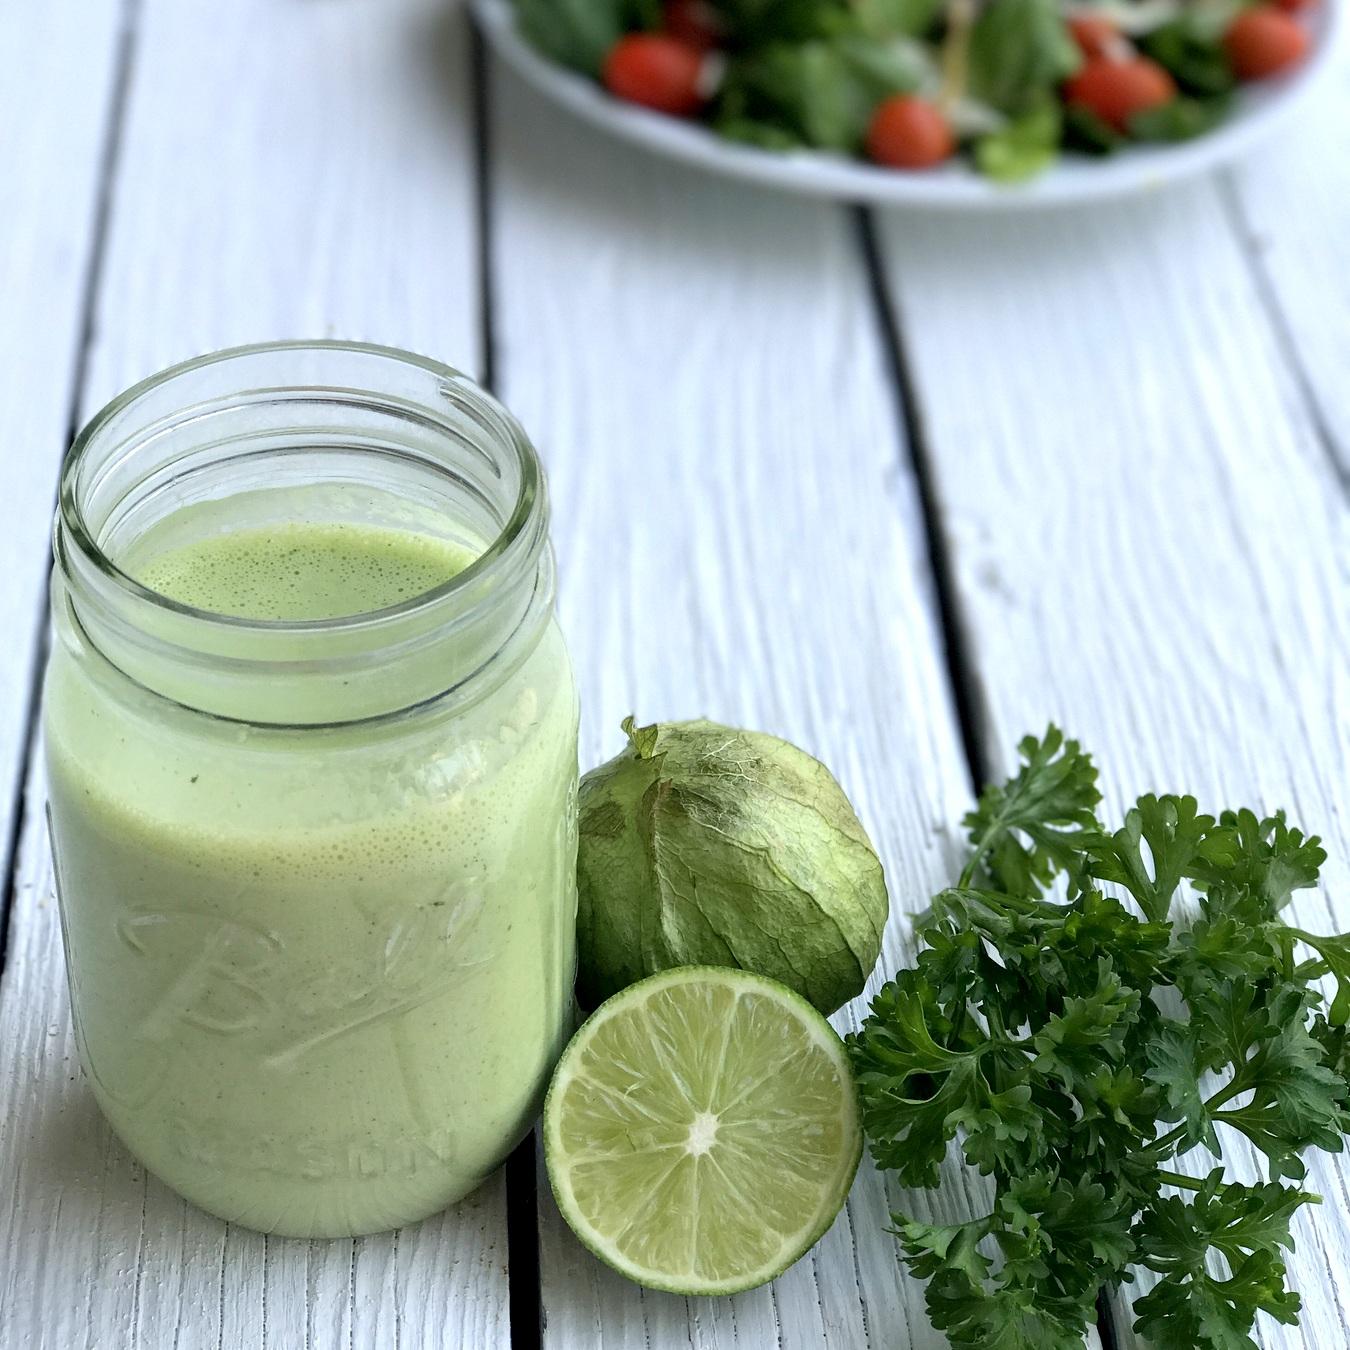 homemade tomatillo ranch- like cafe rio (but without cilantro!)